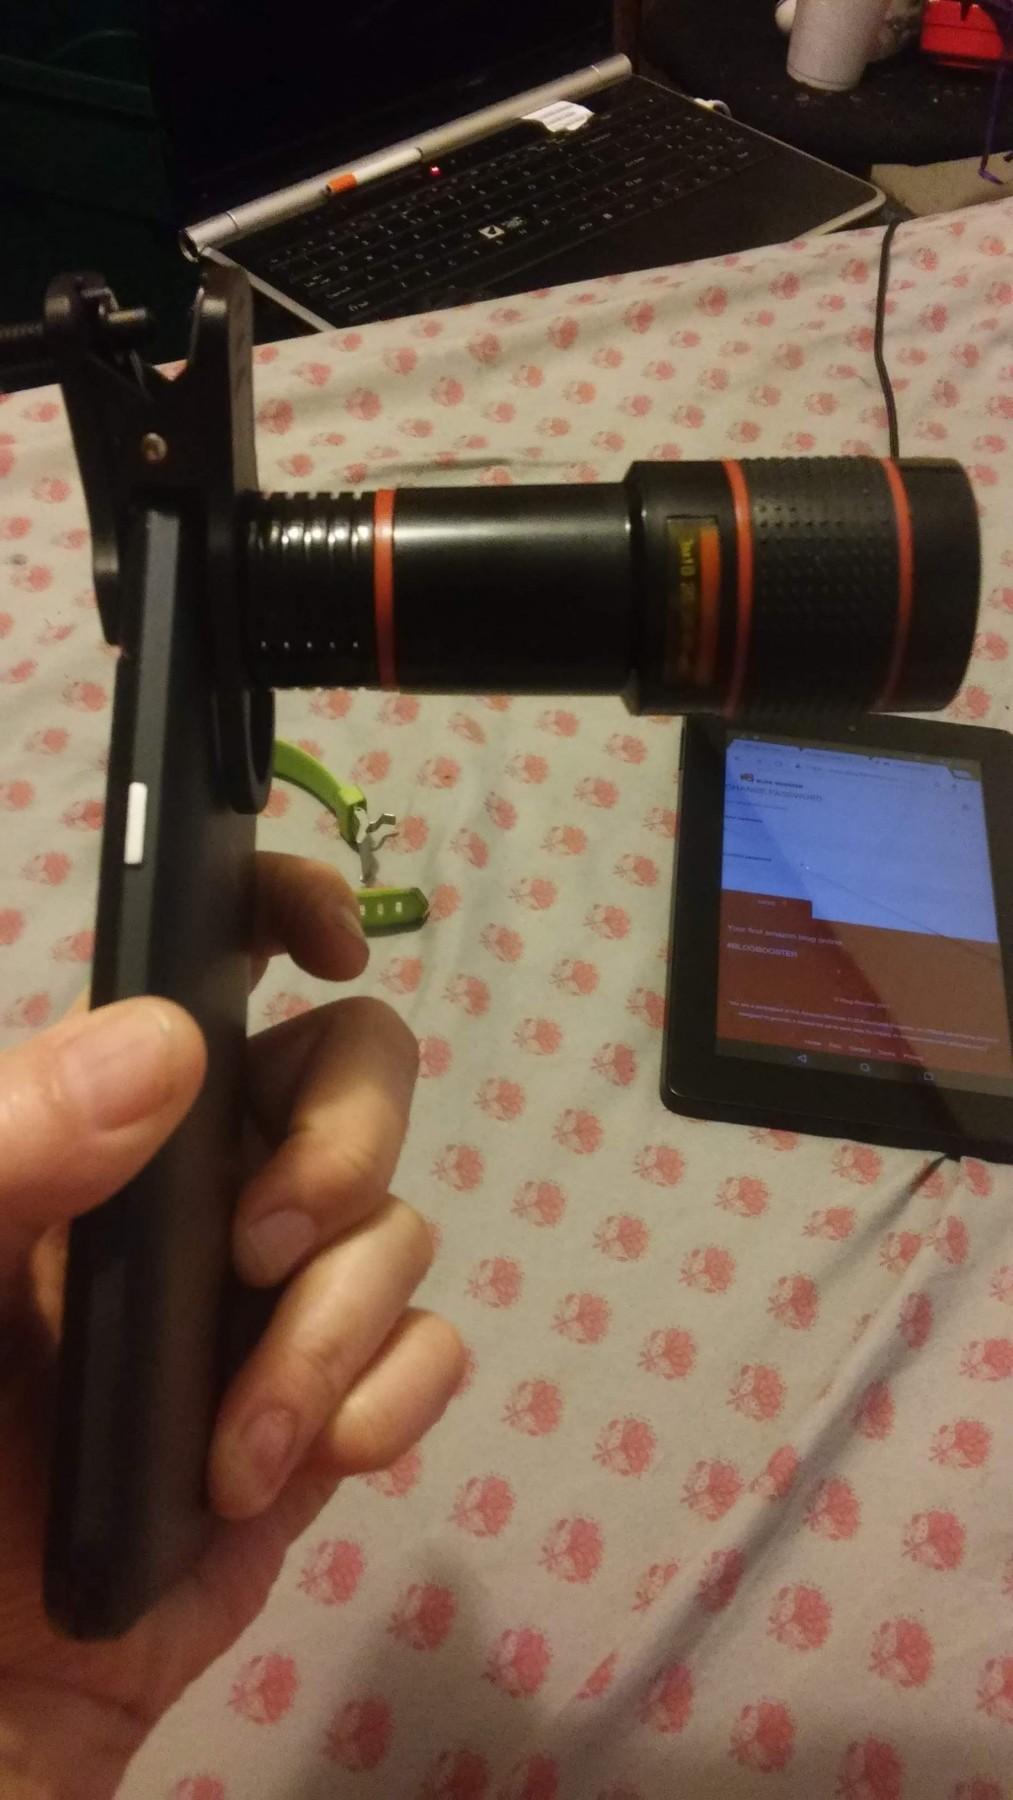 Phone telephoto lens